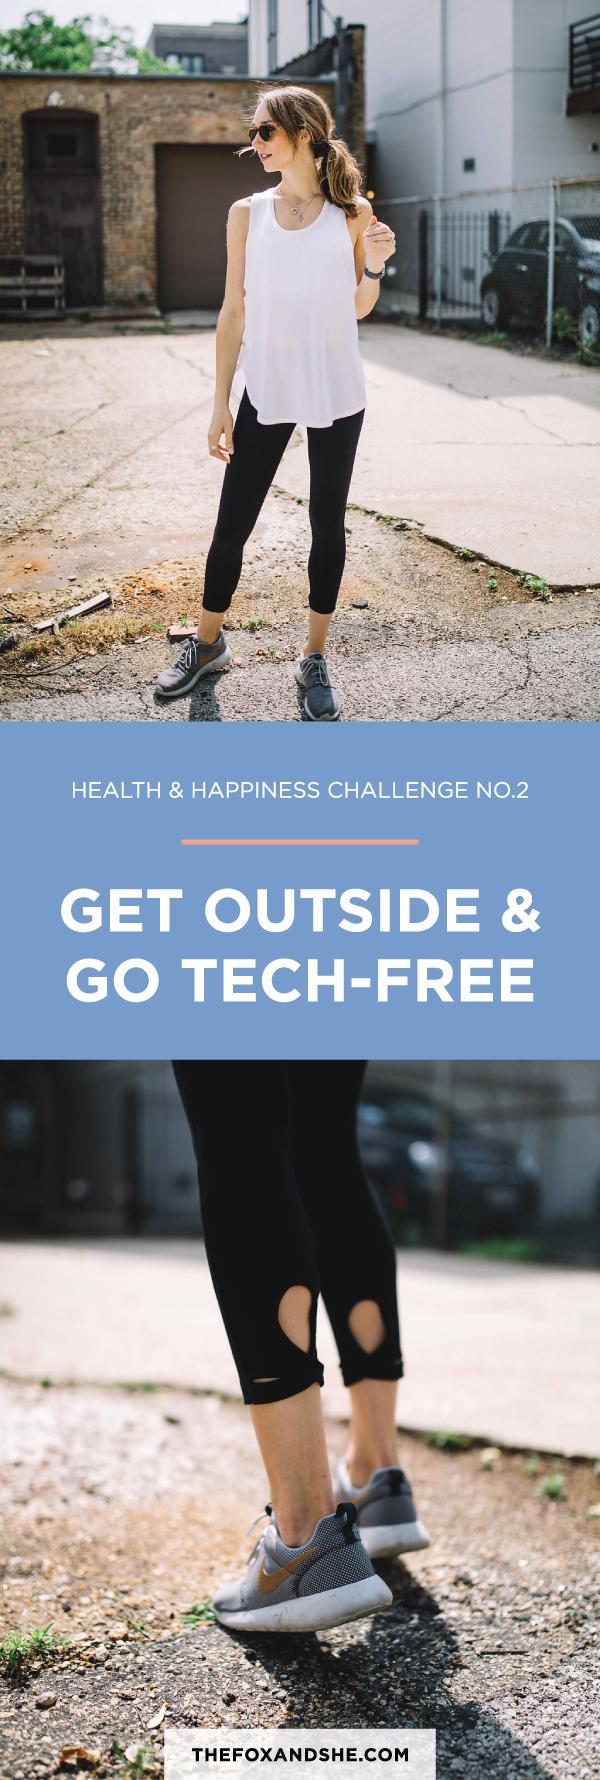 #thefoxandshecom #challenge #actually #wellness #fitness #feeling #simple #health #daily #awake #eac...